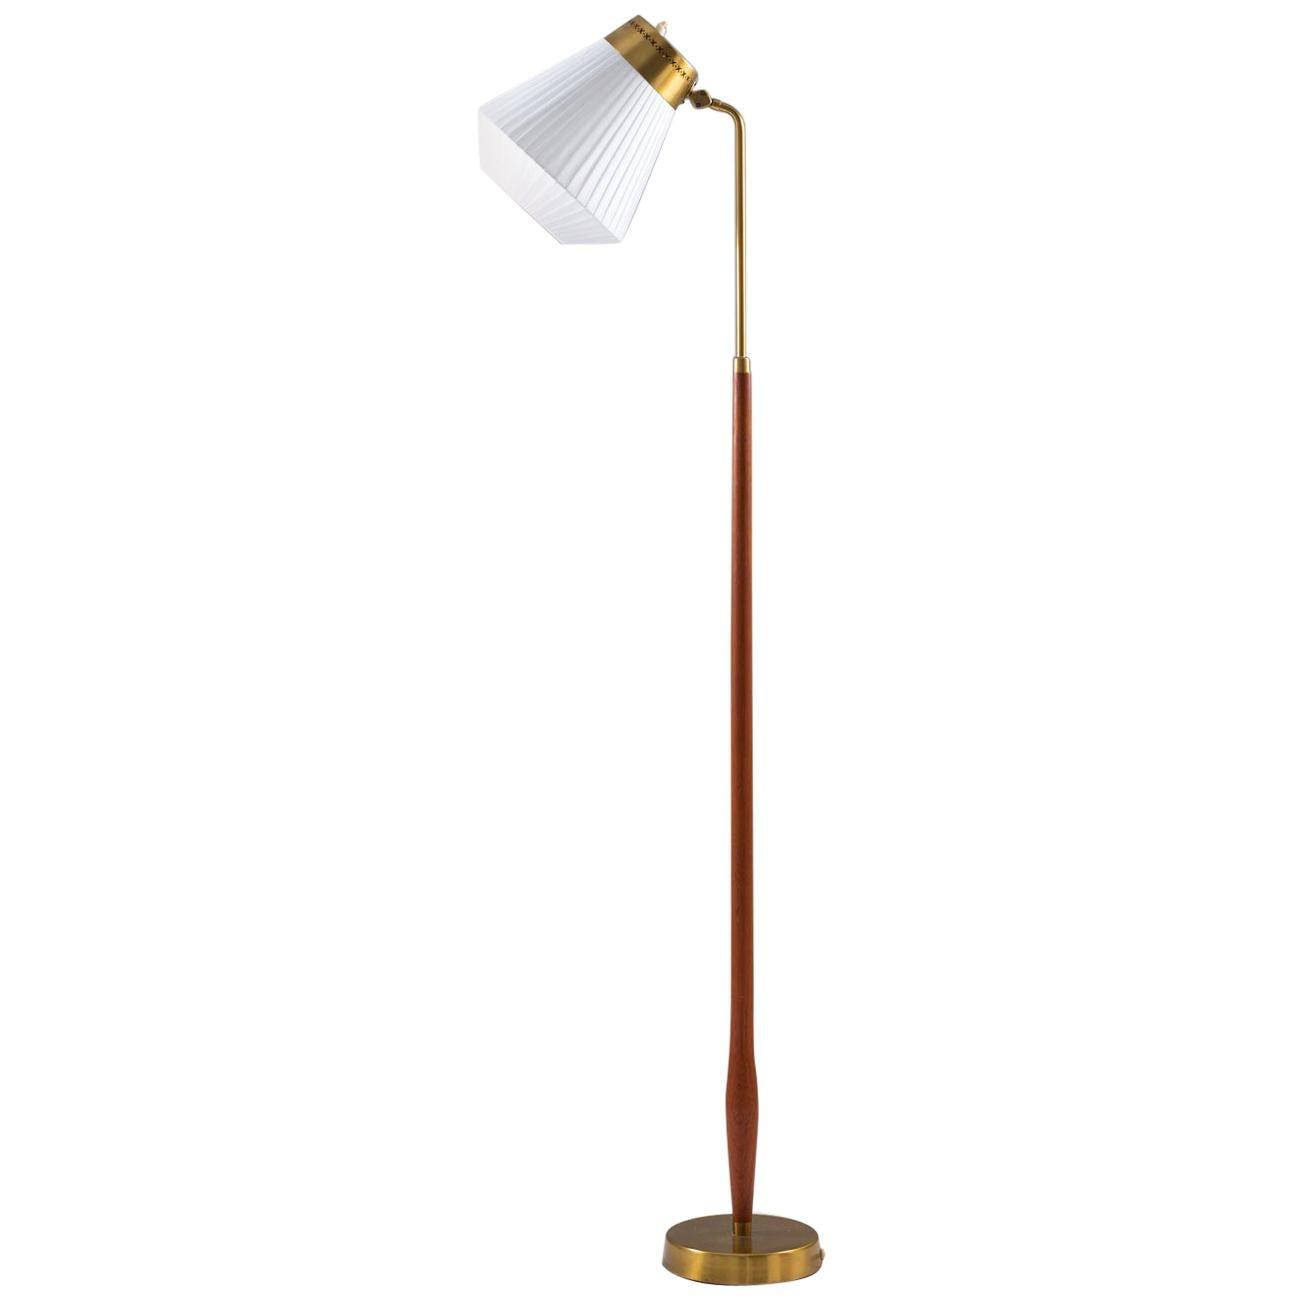 Swedish Midcentury Floor Lamp in Brass and Teak by ASEA, 1950s